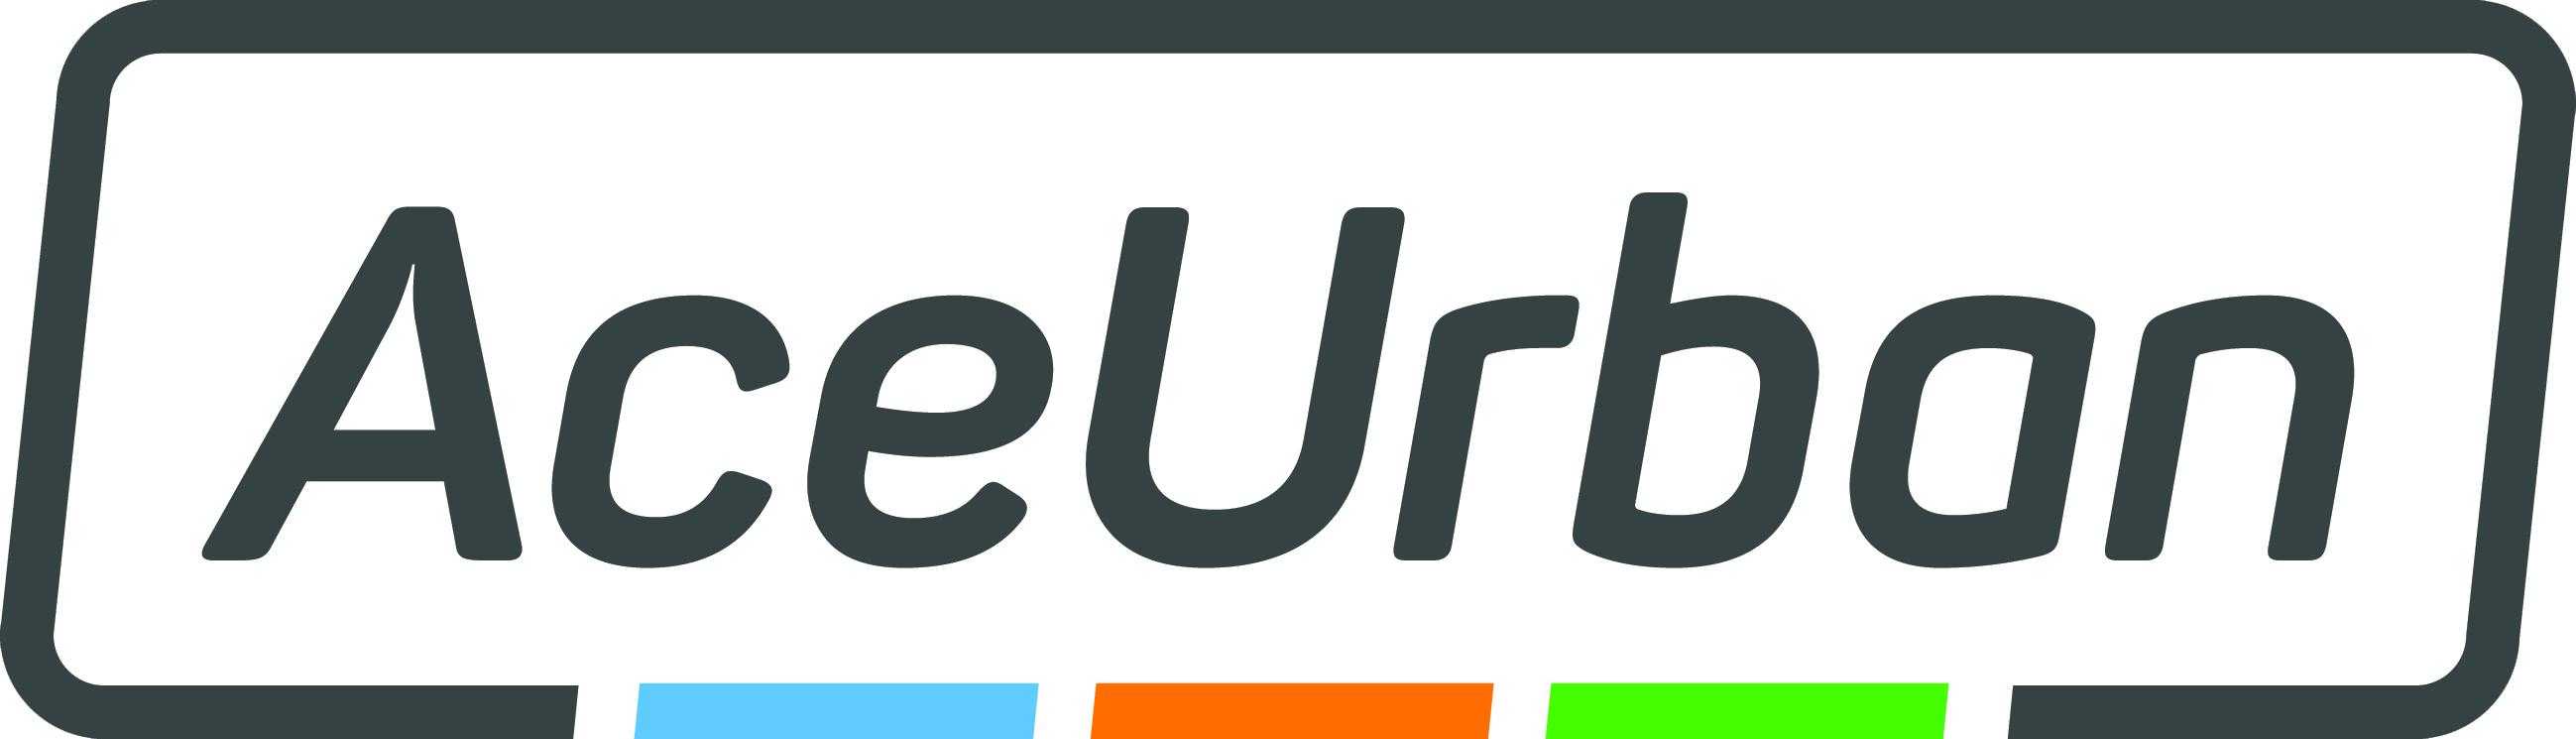 ace urban logo